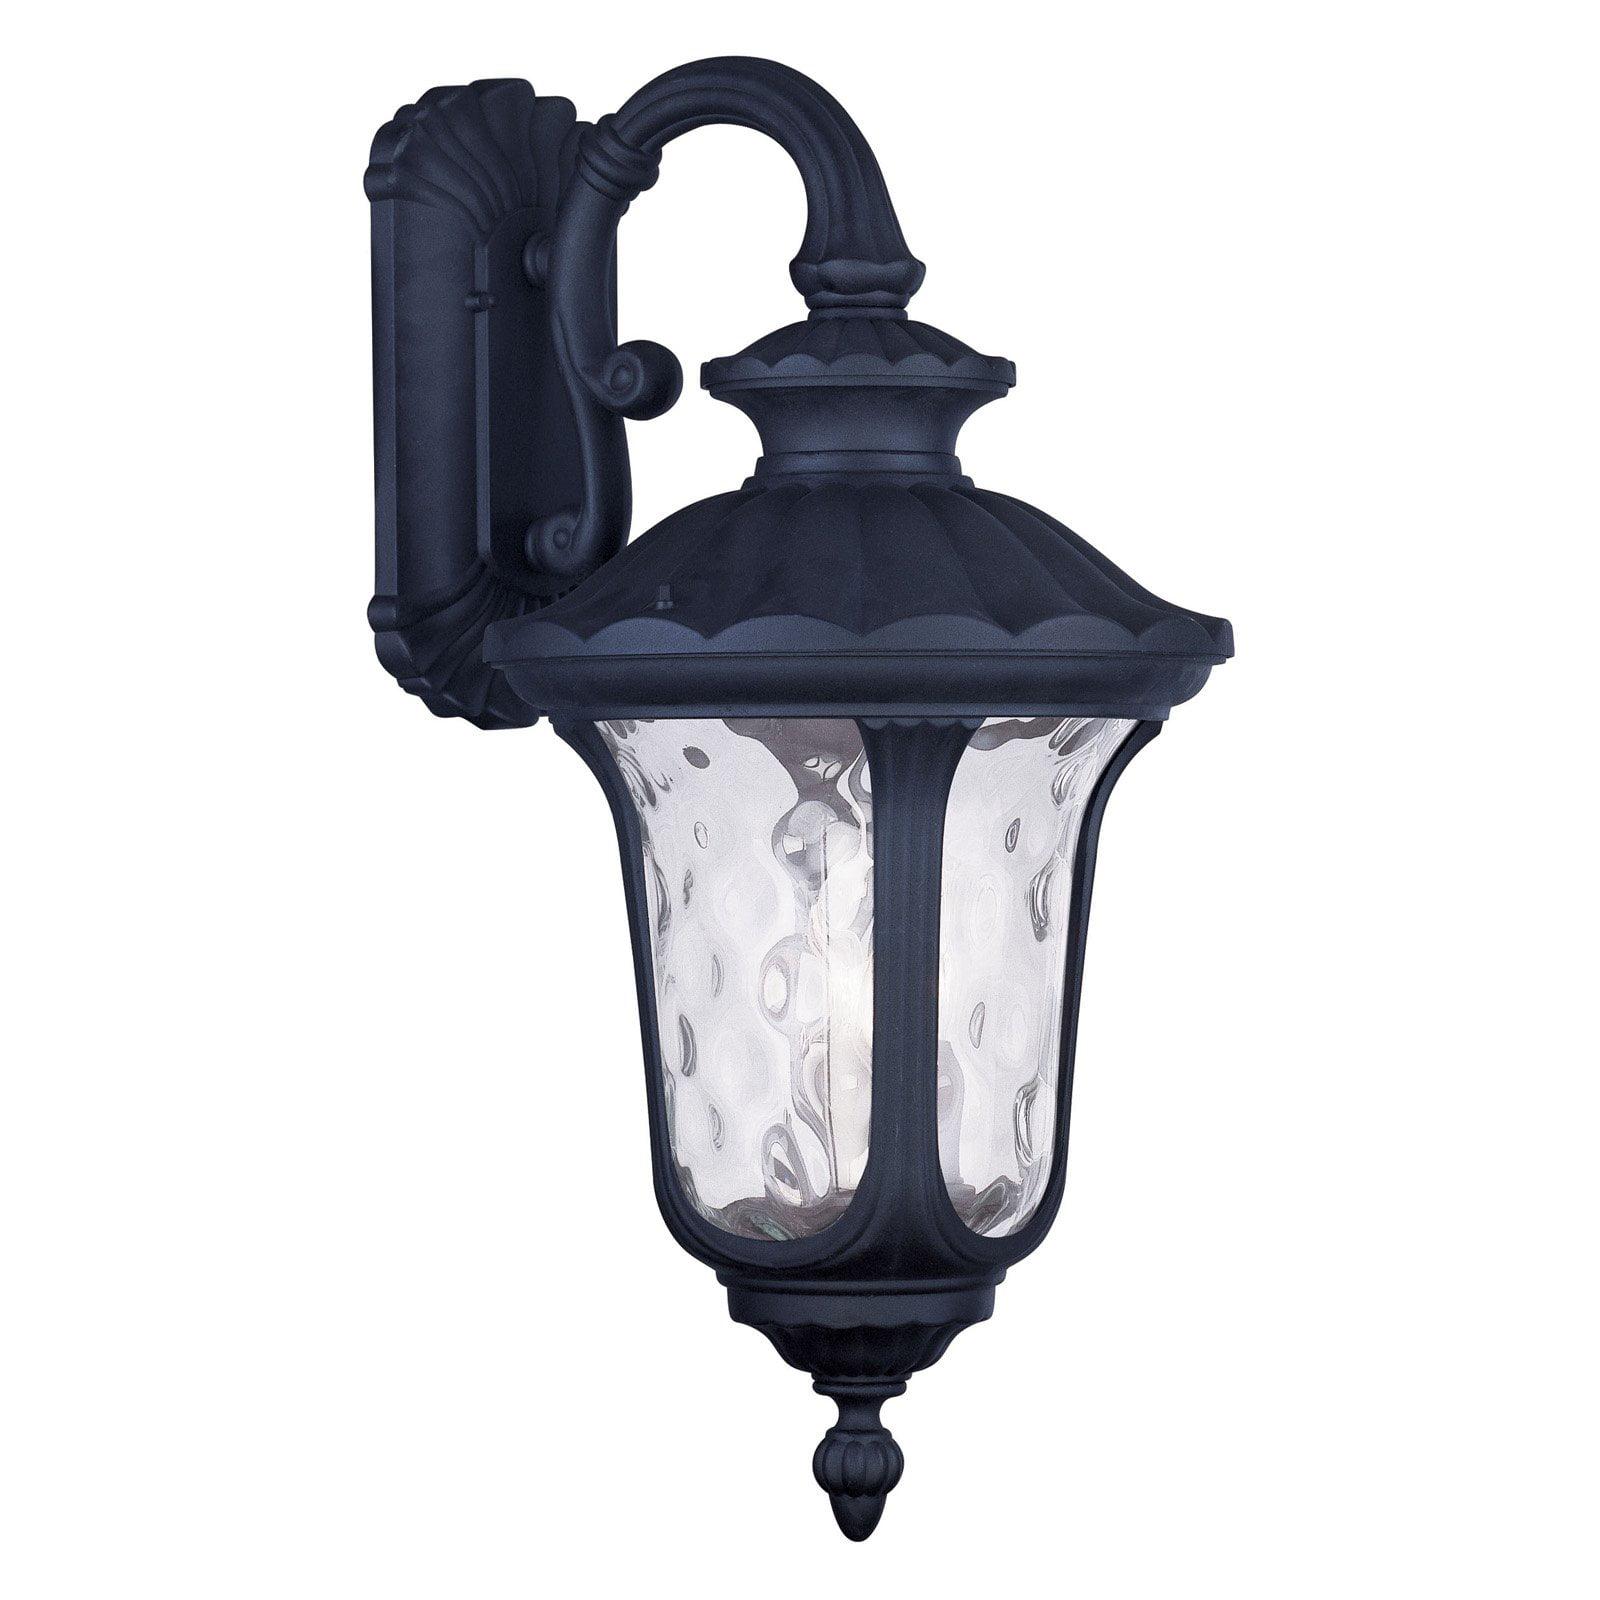 Livex Oxford 7857-04 3-Light Outdoor Wall Lantern in Black